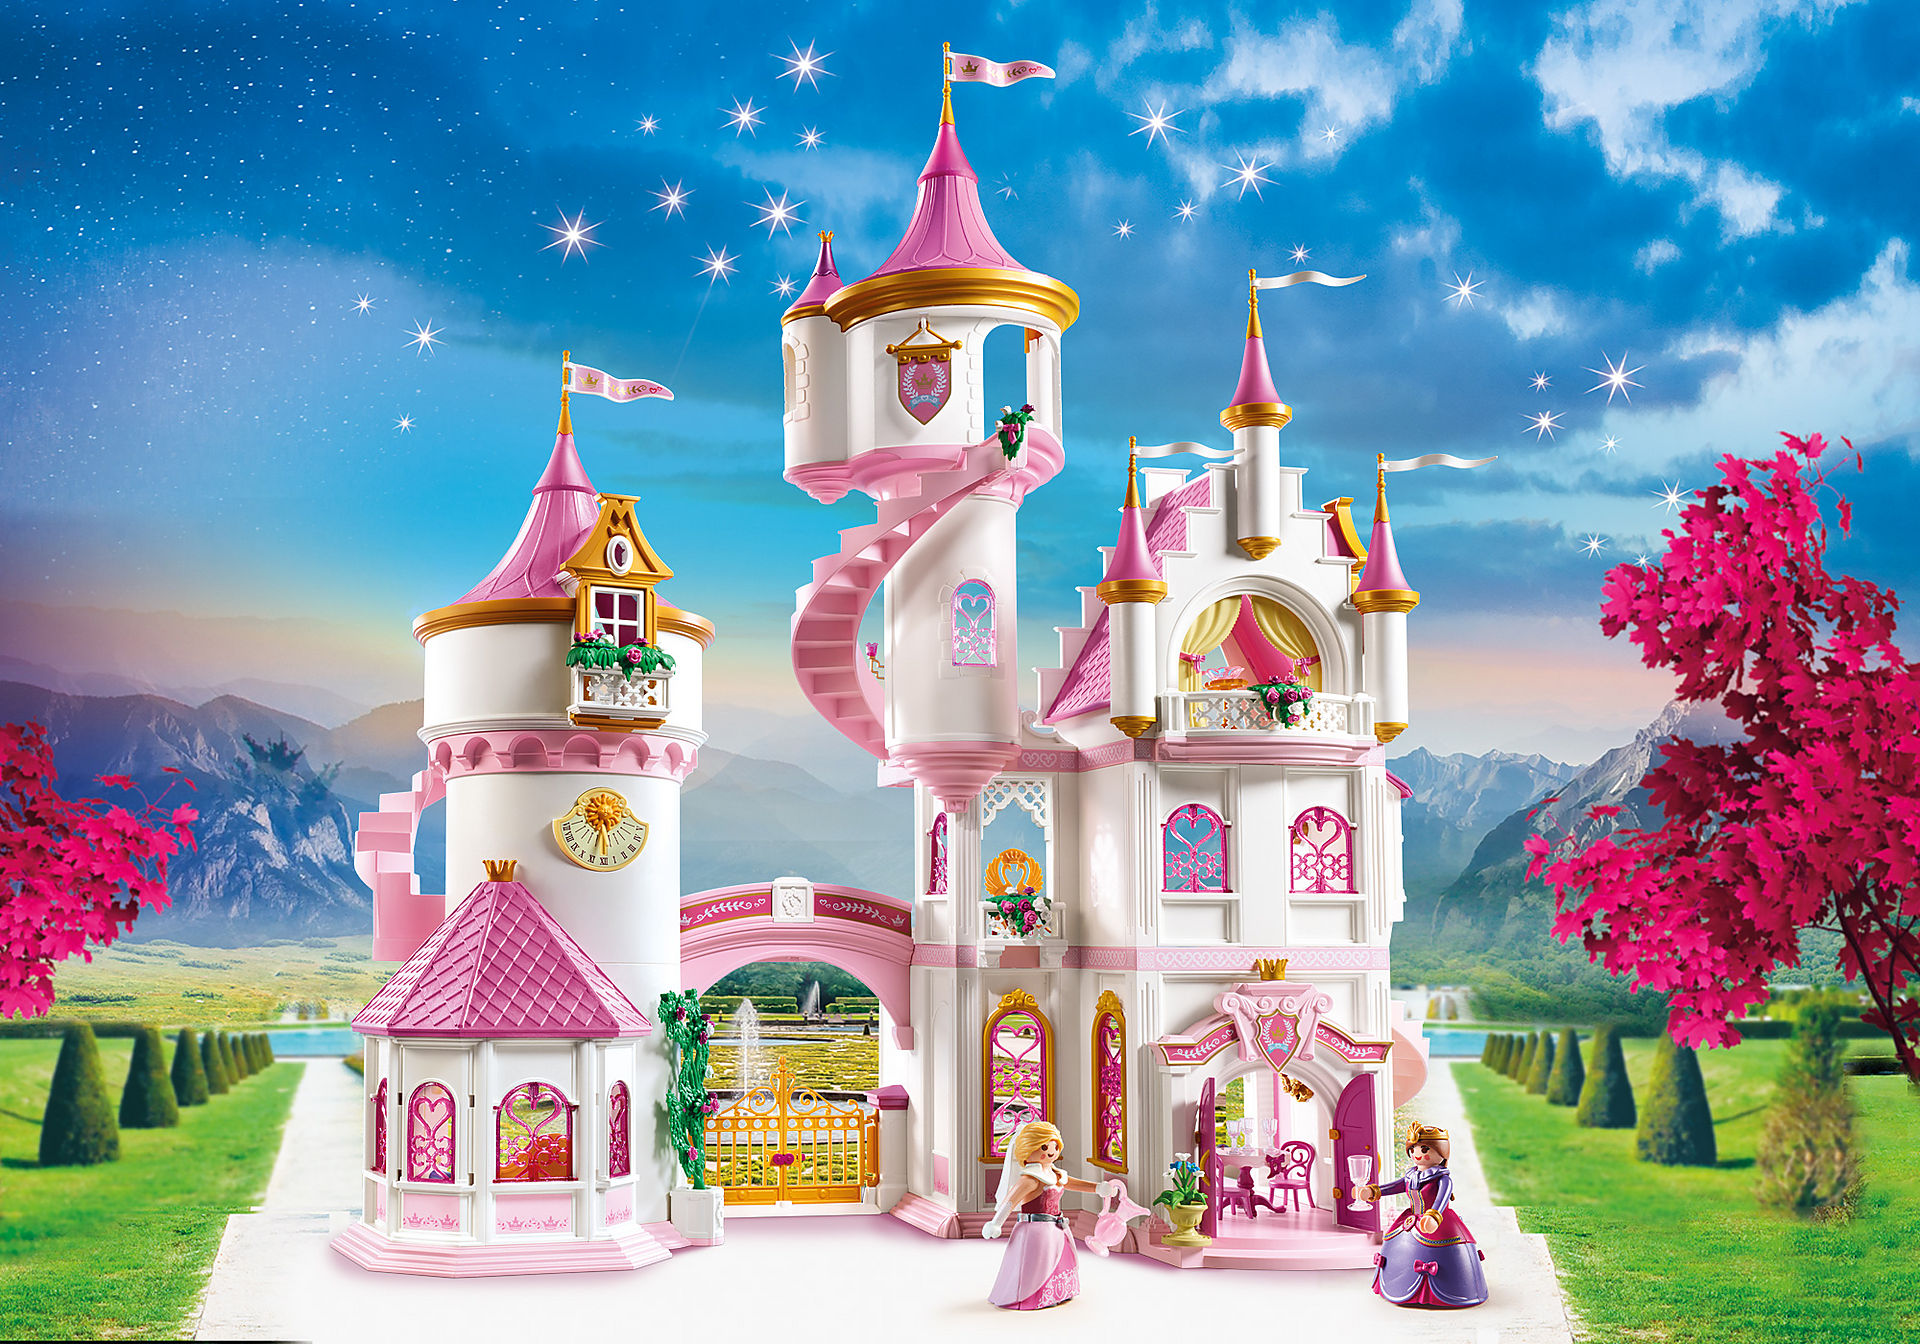 70447 Large Princess Castle zoom image1